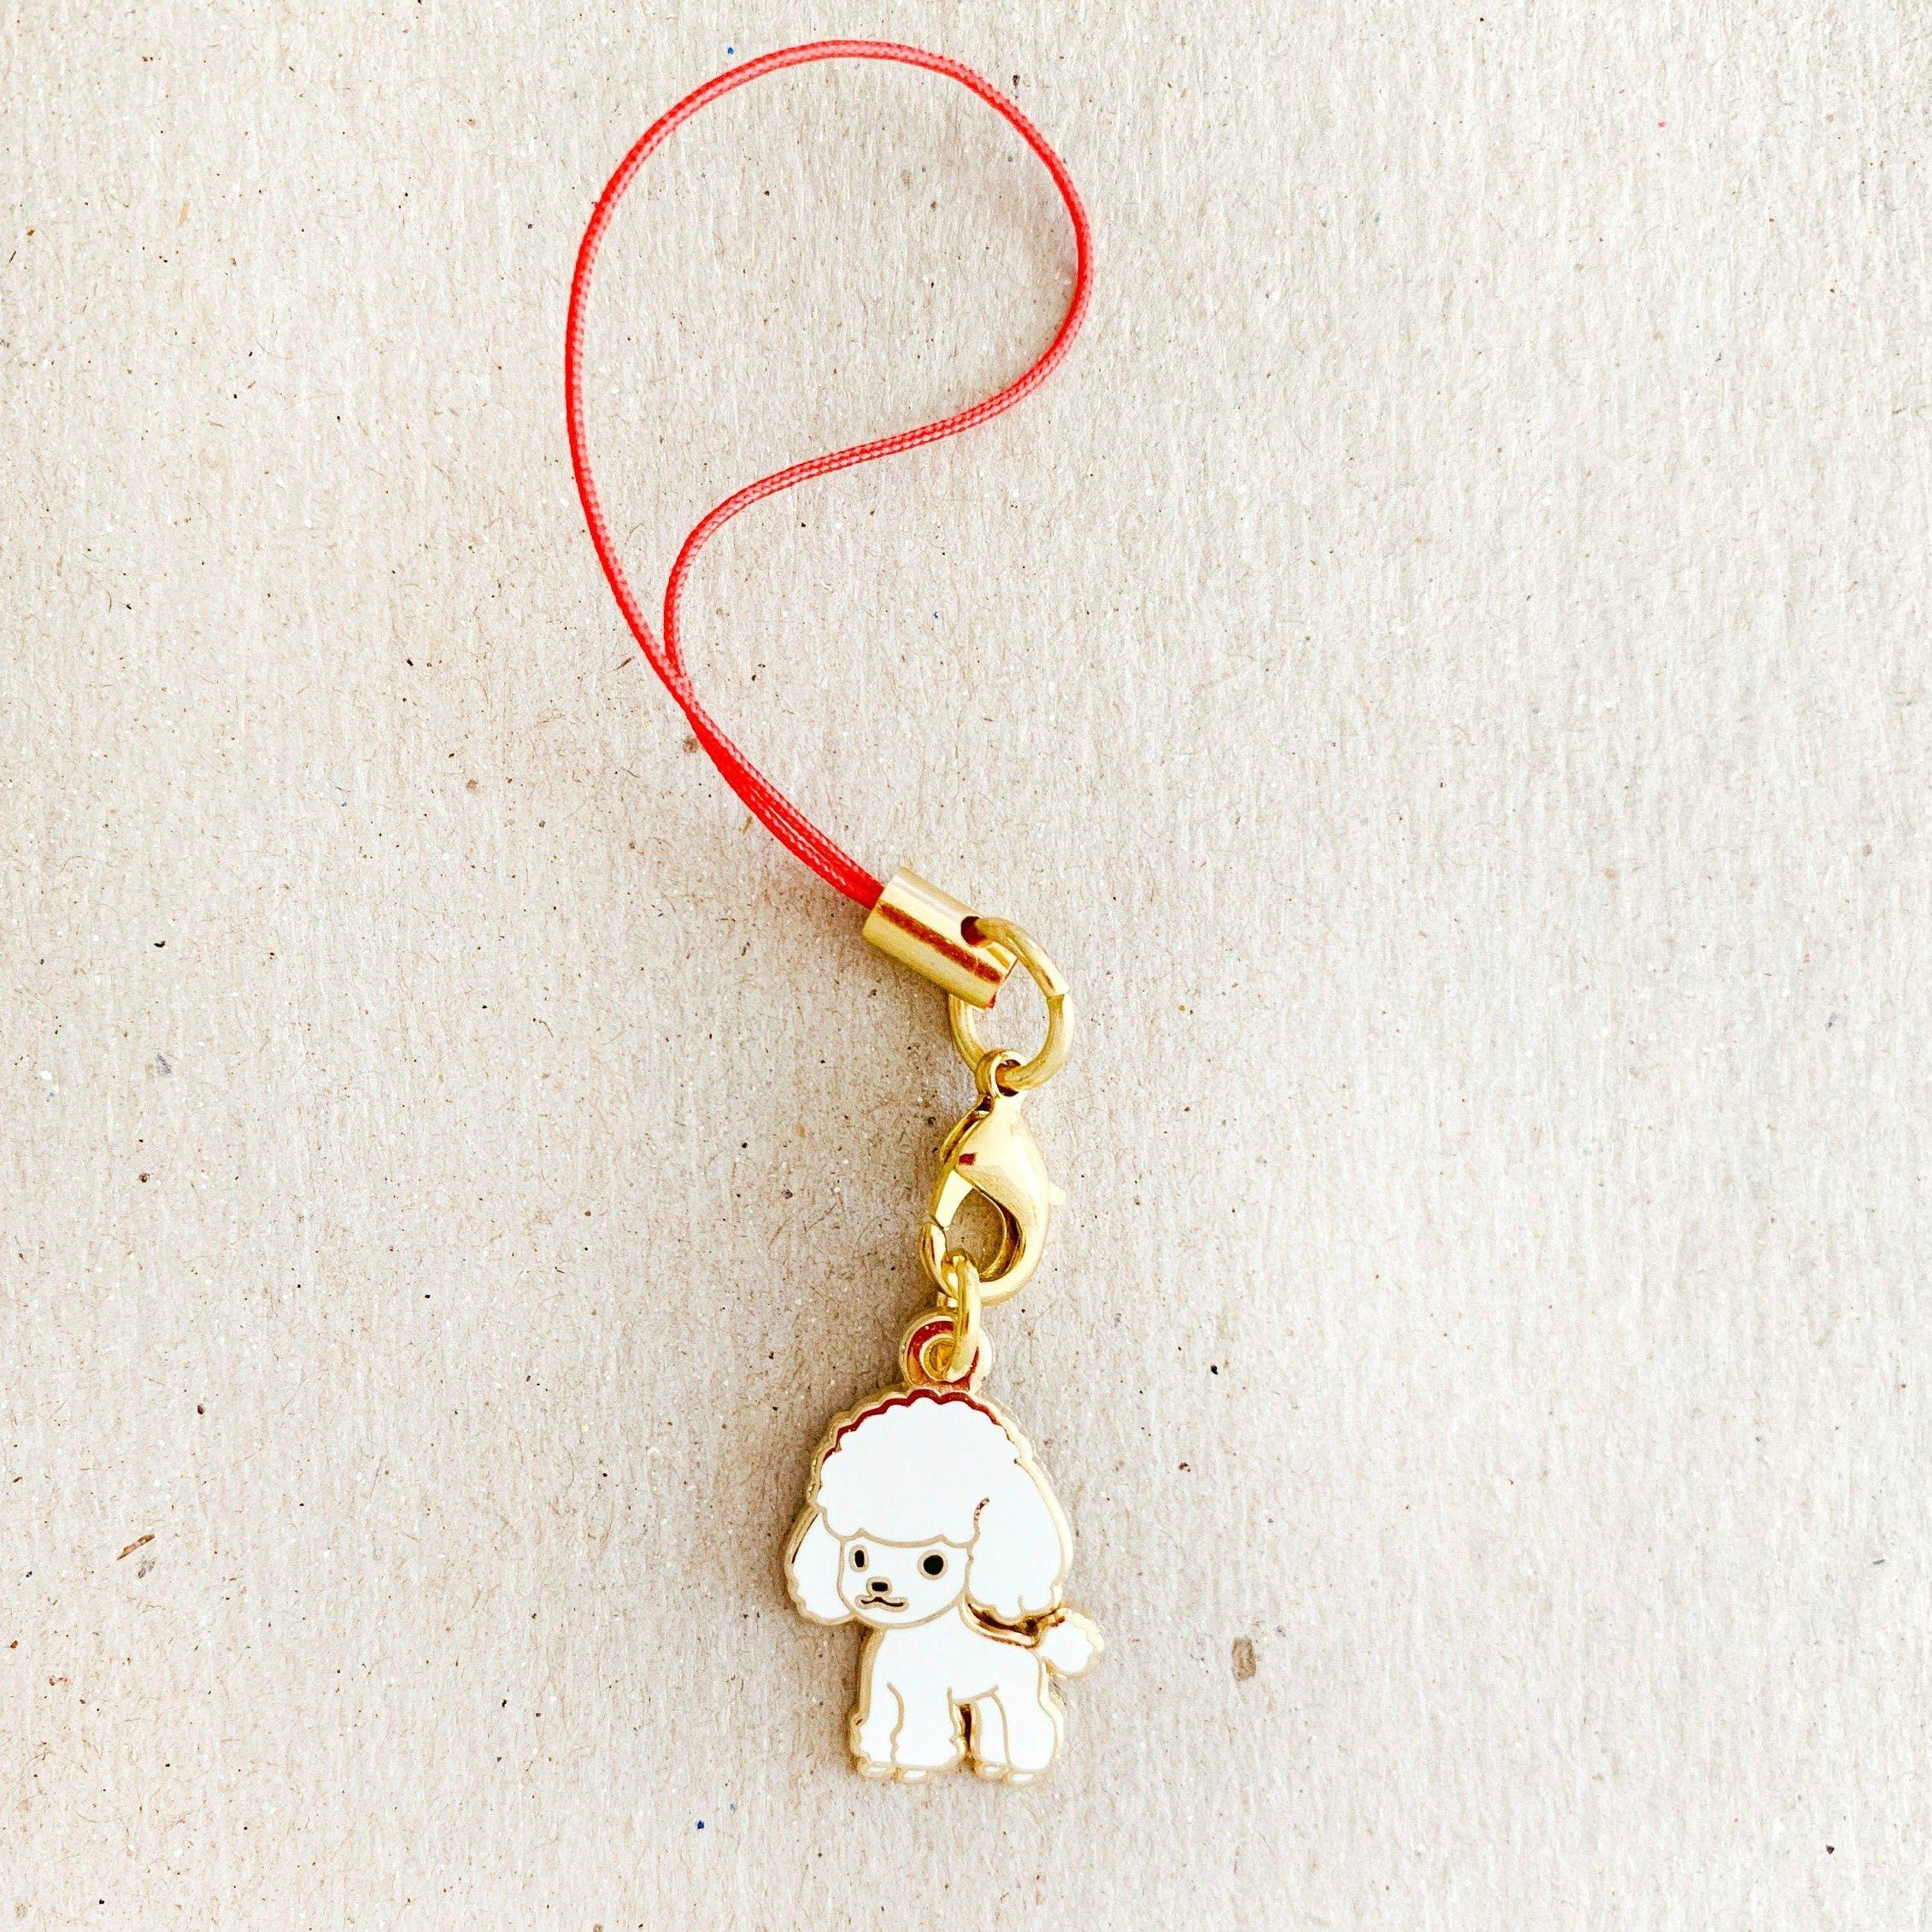 Enamel Charm - Standard Poodle Keychain (White)